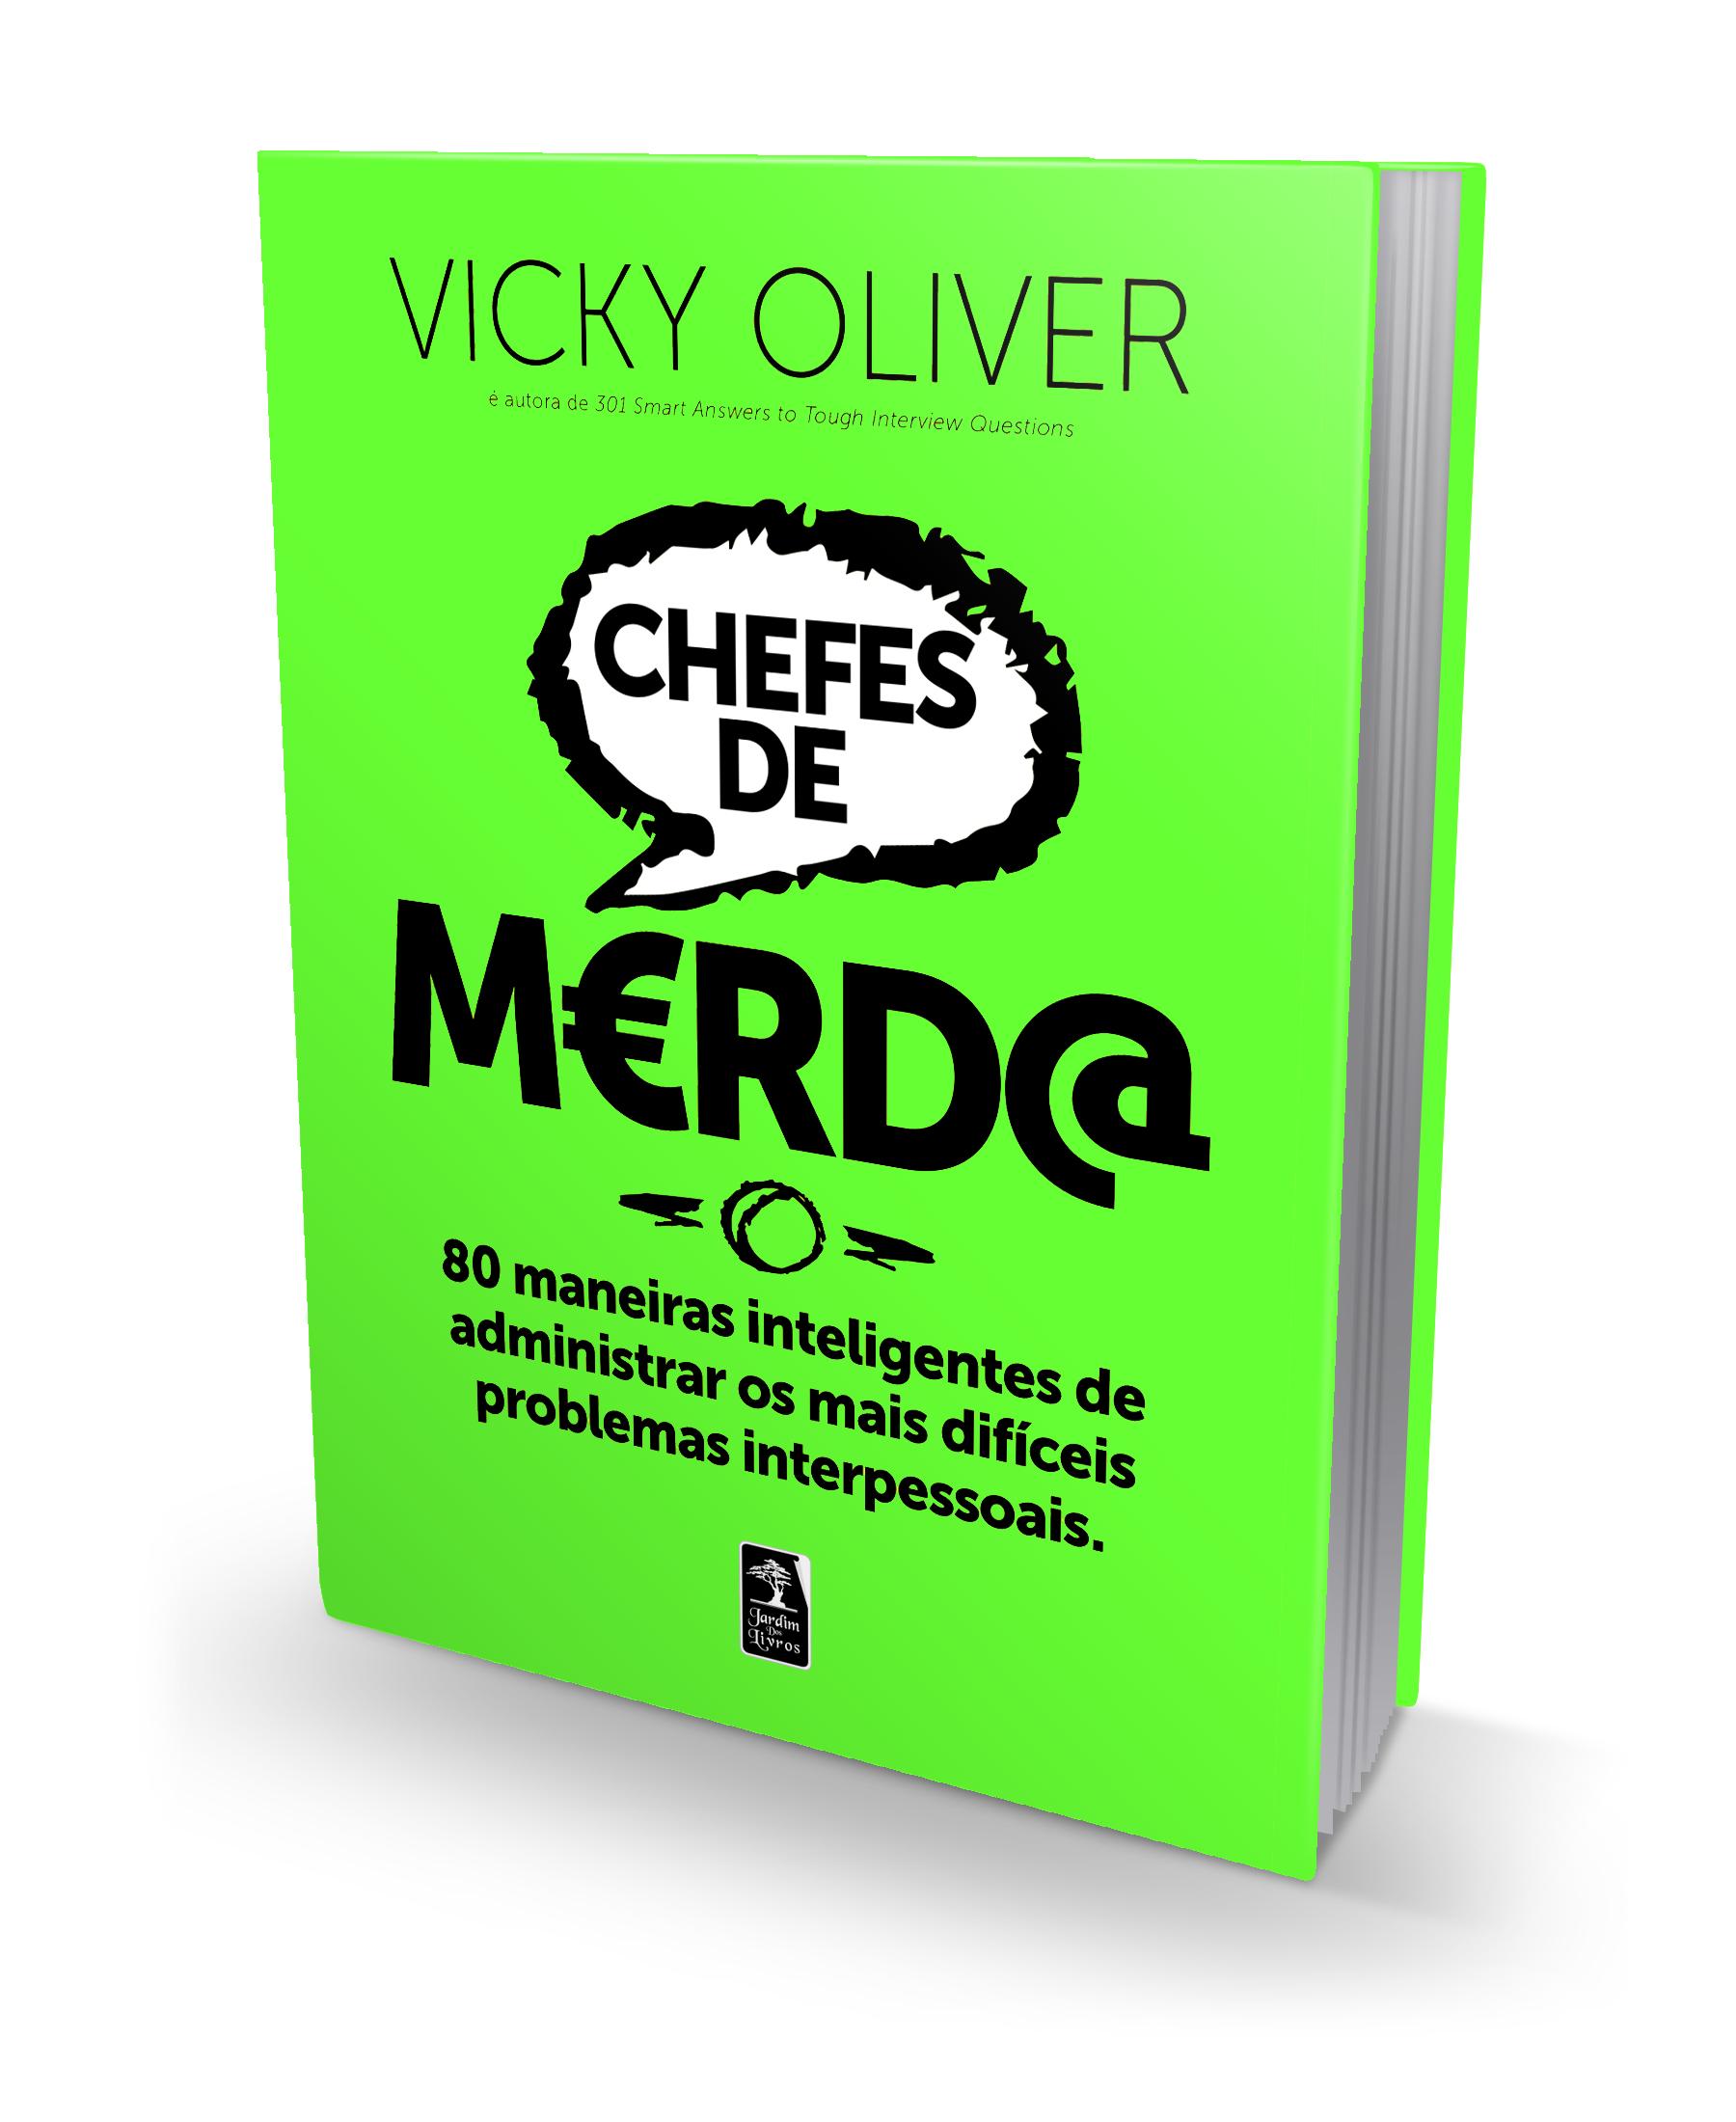 CHEFES DE MERDA